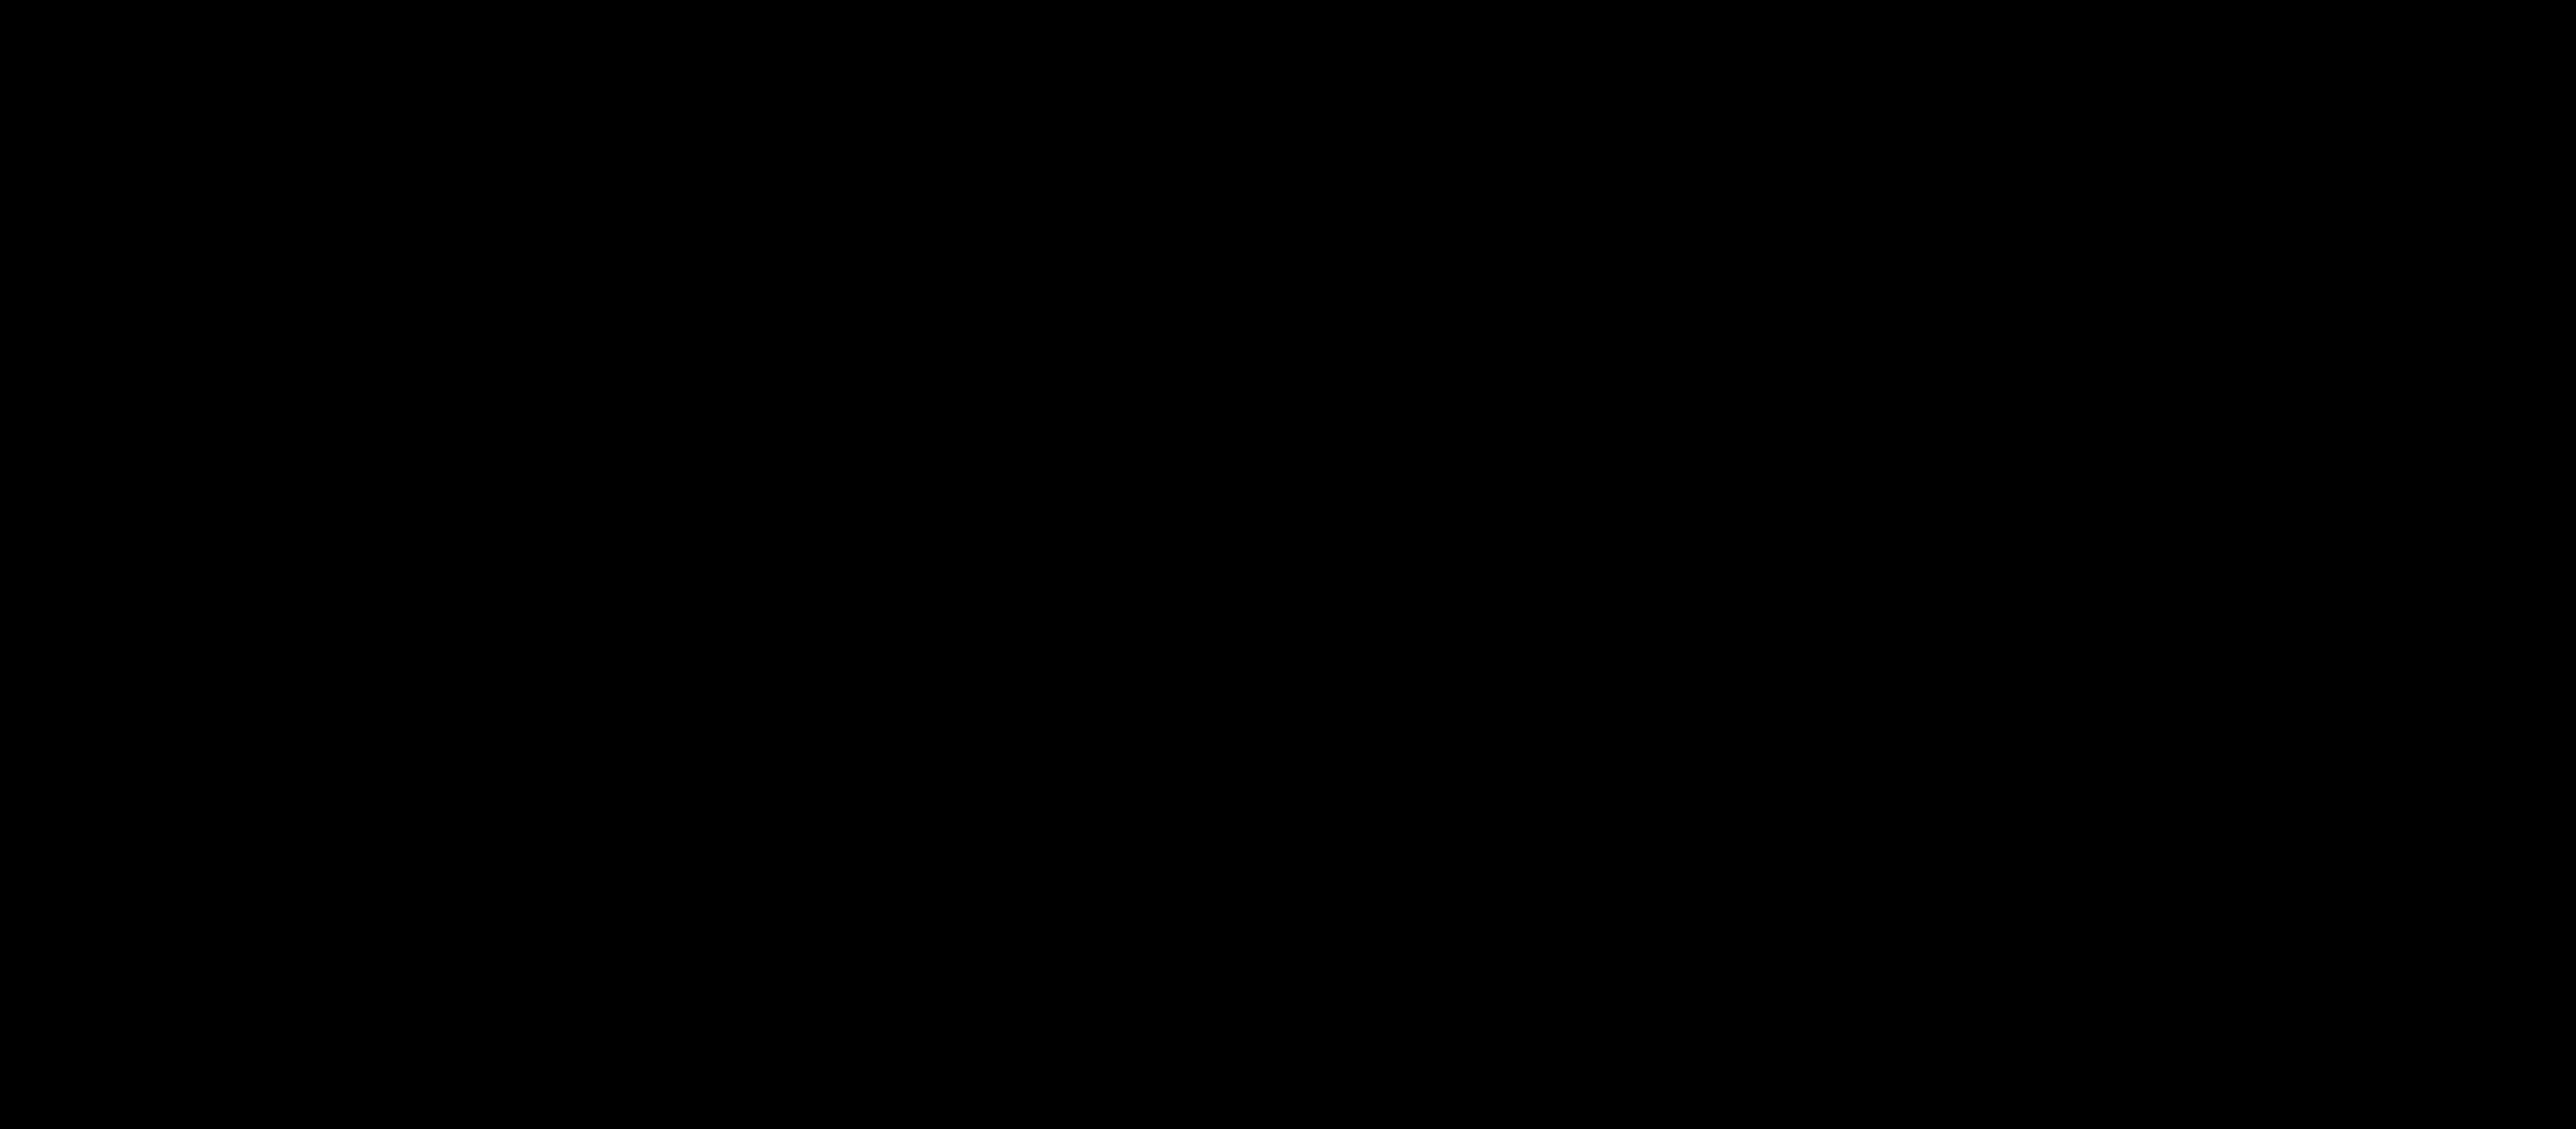 5000x2191 Wars Star Wars Logo Design Vector Free Download